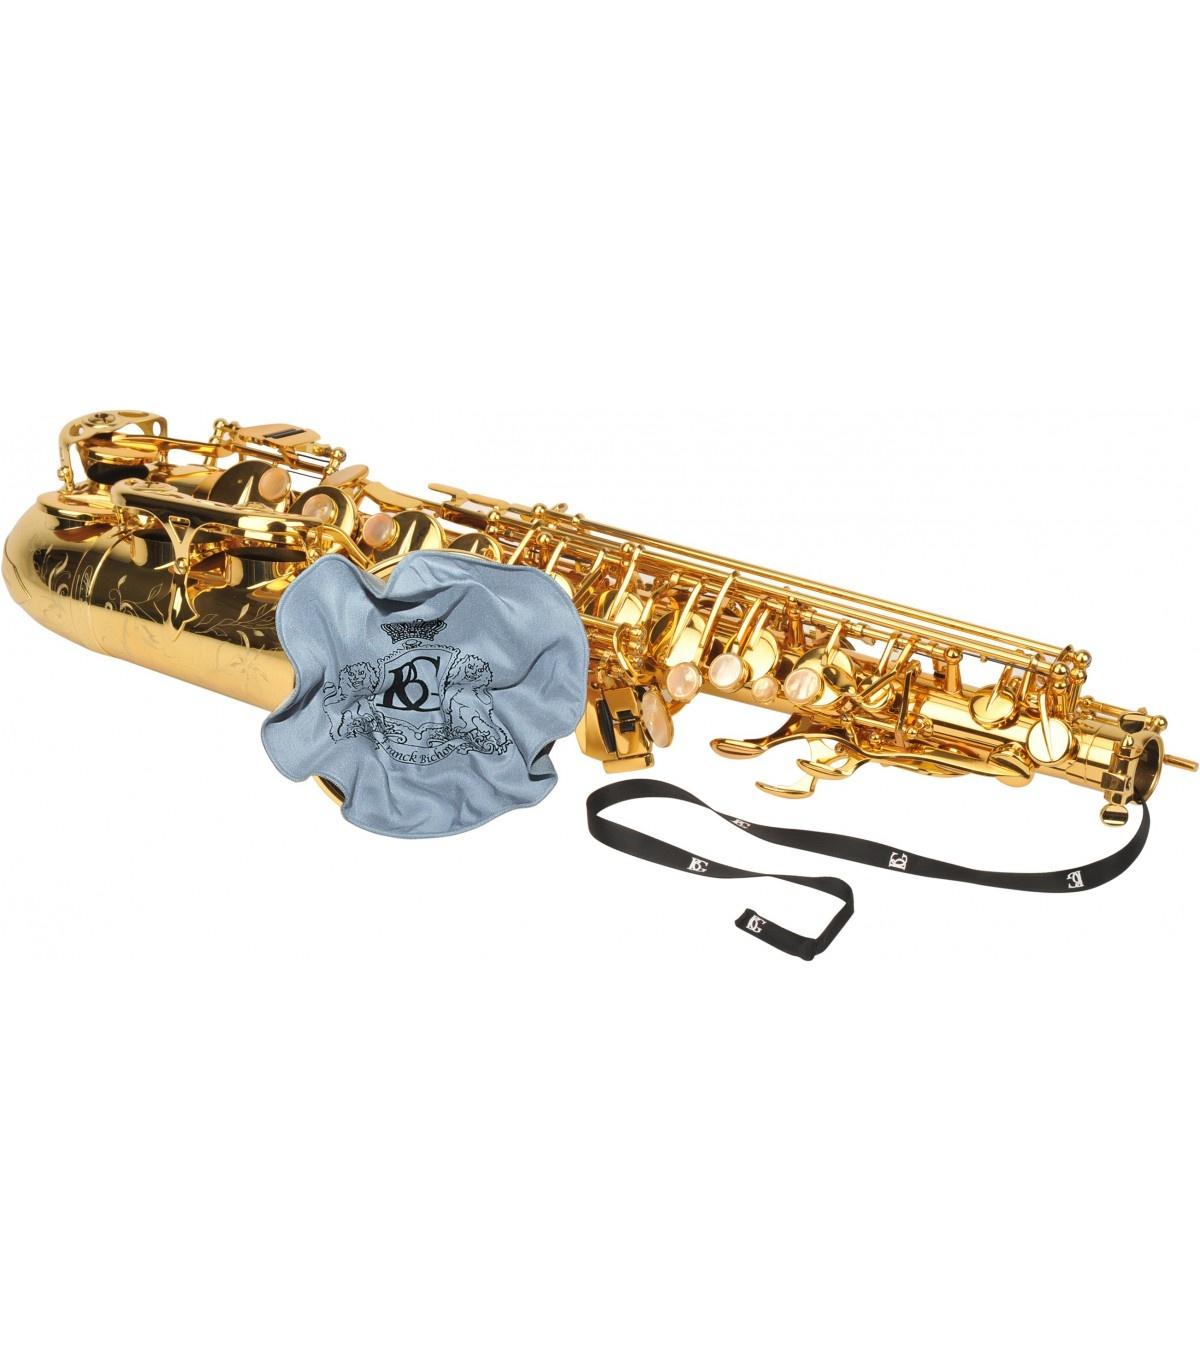 BG France BG Alto Sax/Bass Clarinet Body Swab - Microfiber